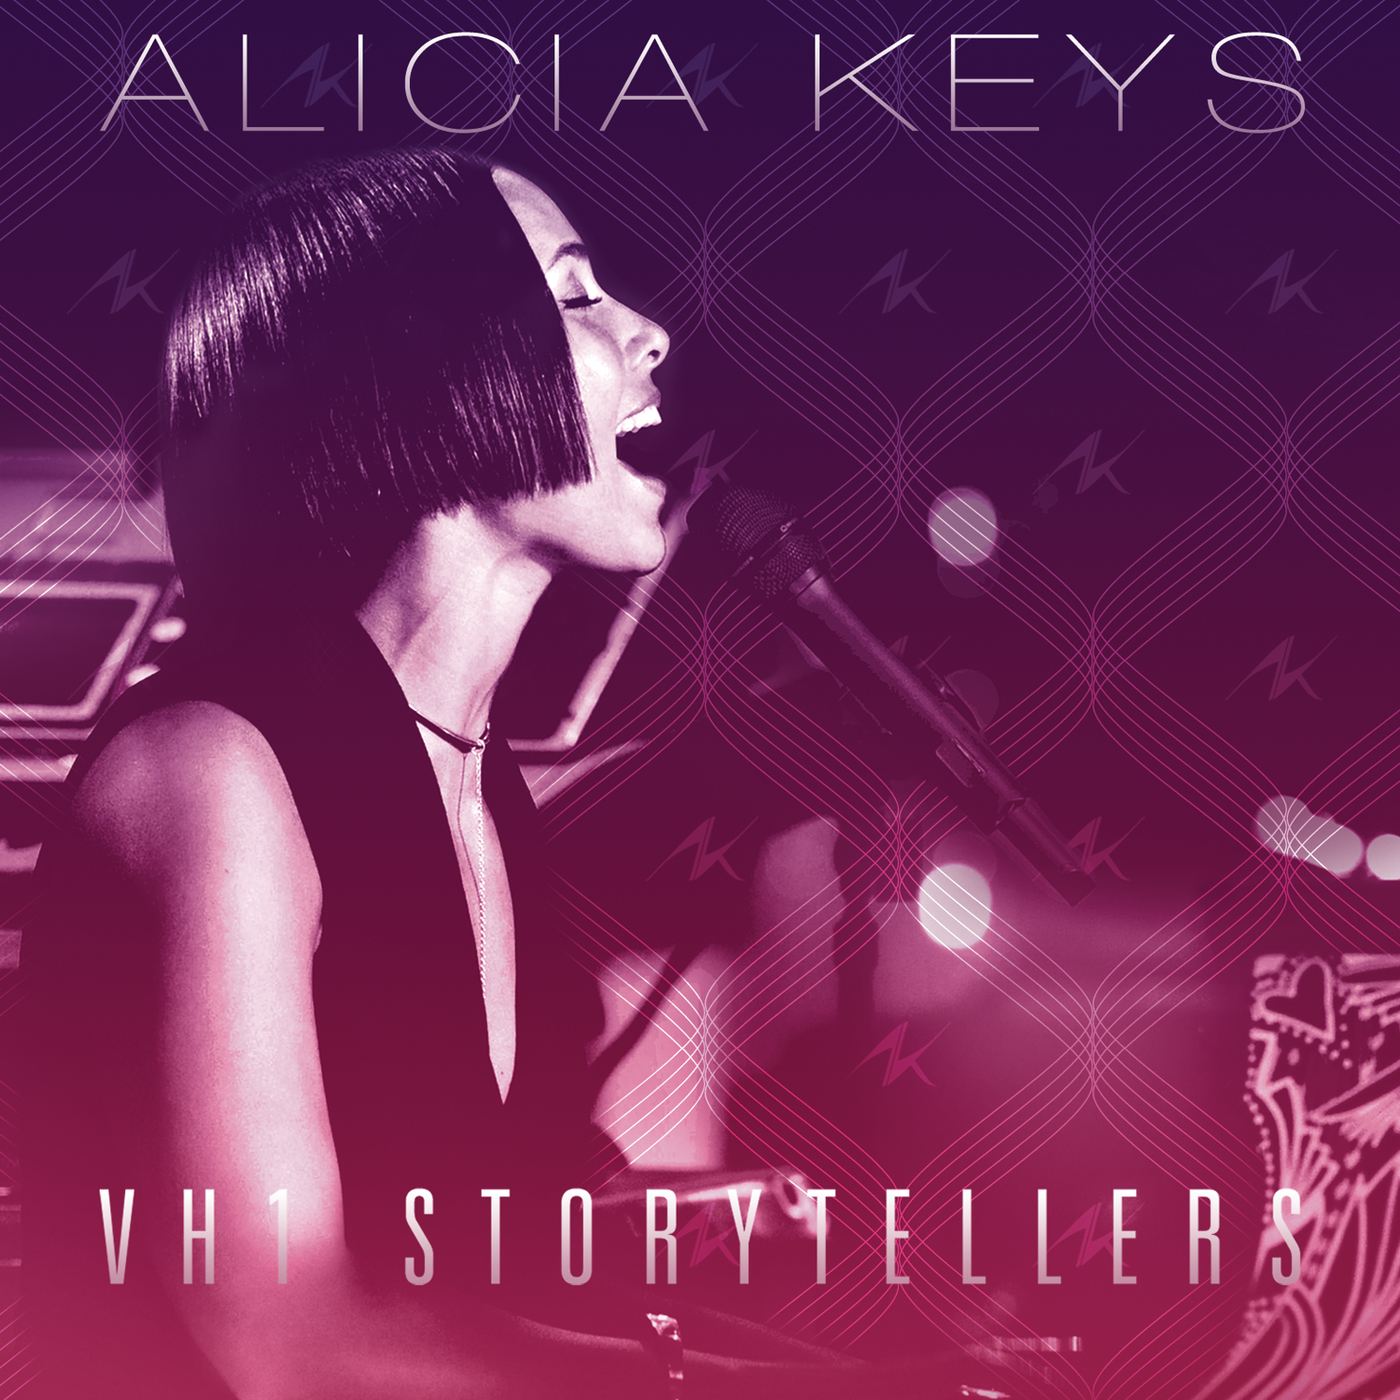 VH1 Storytellers - Alicia Keys